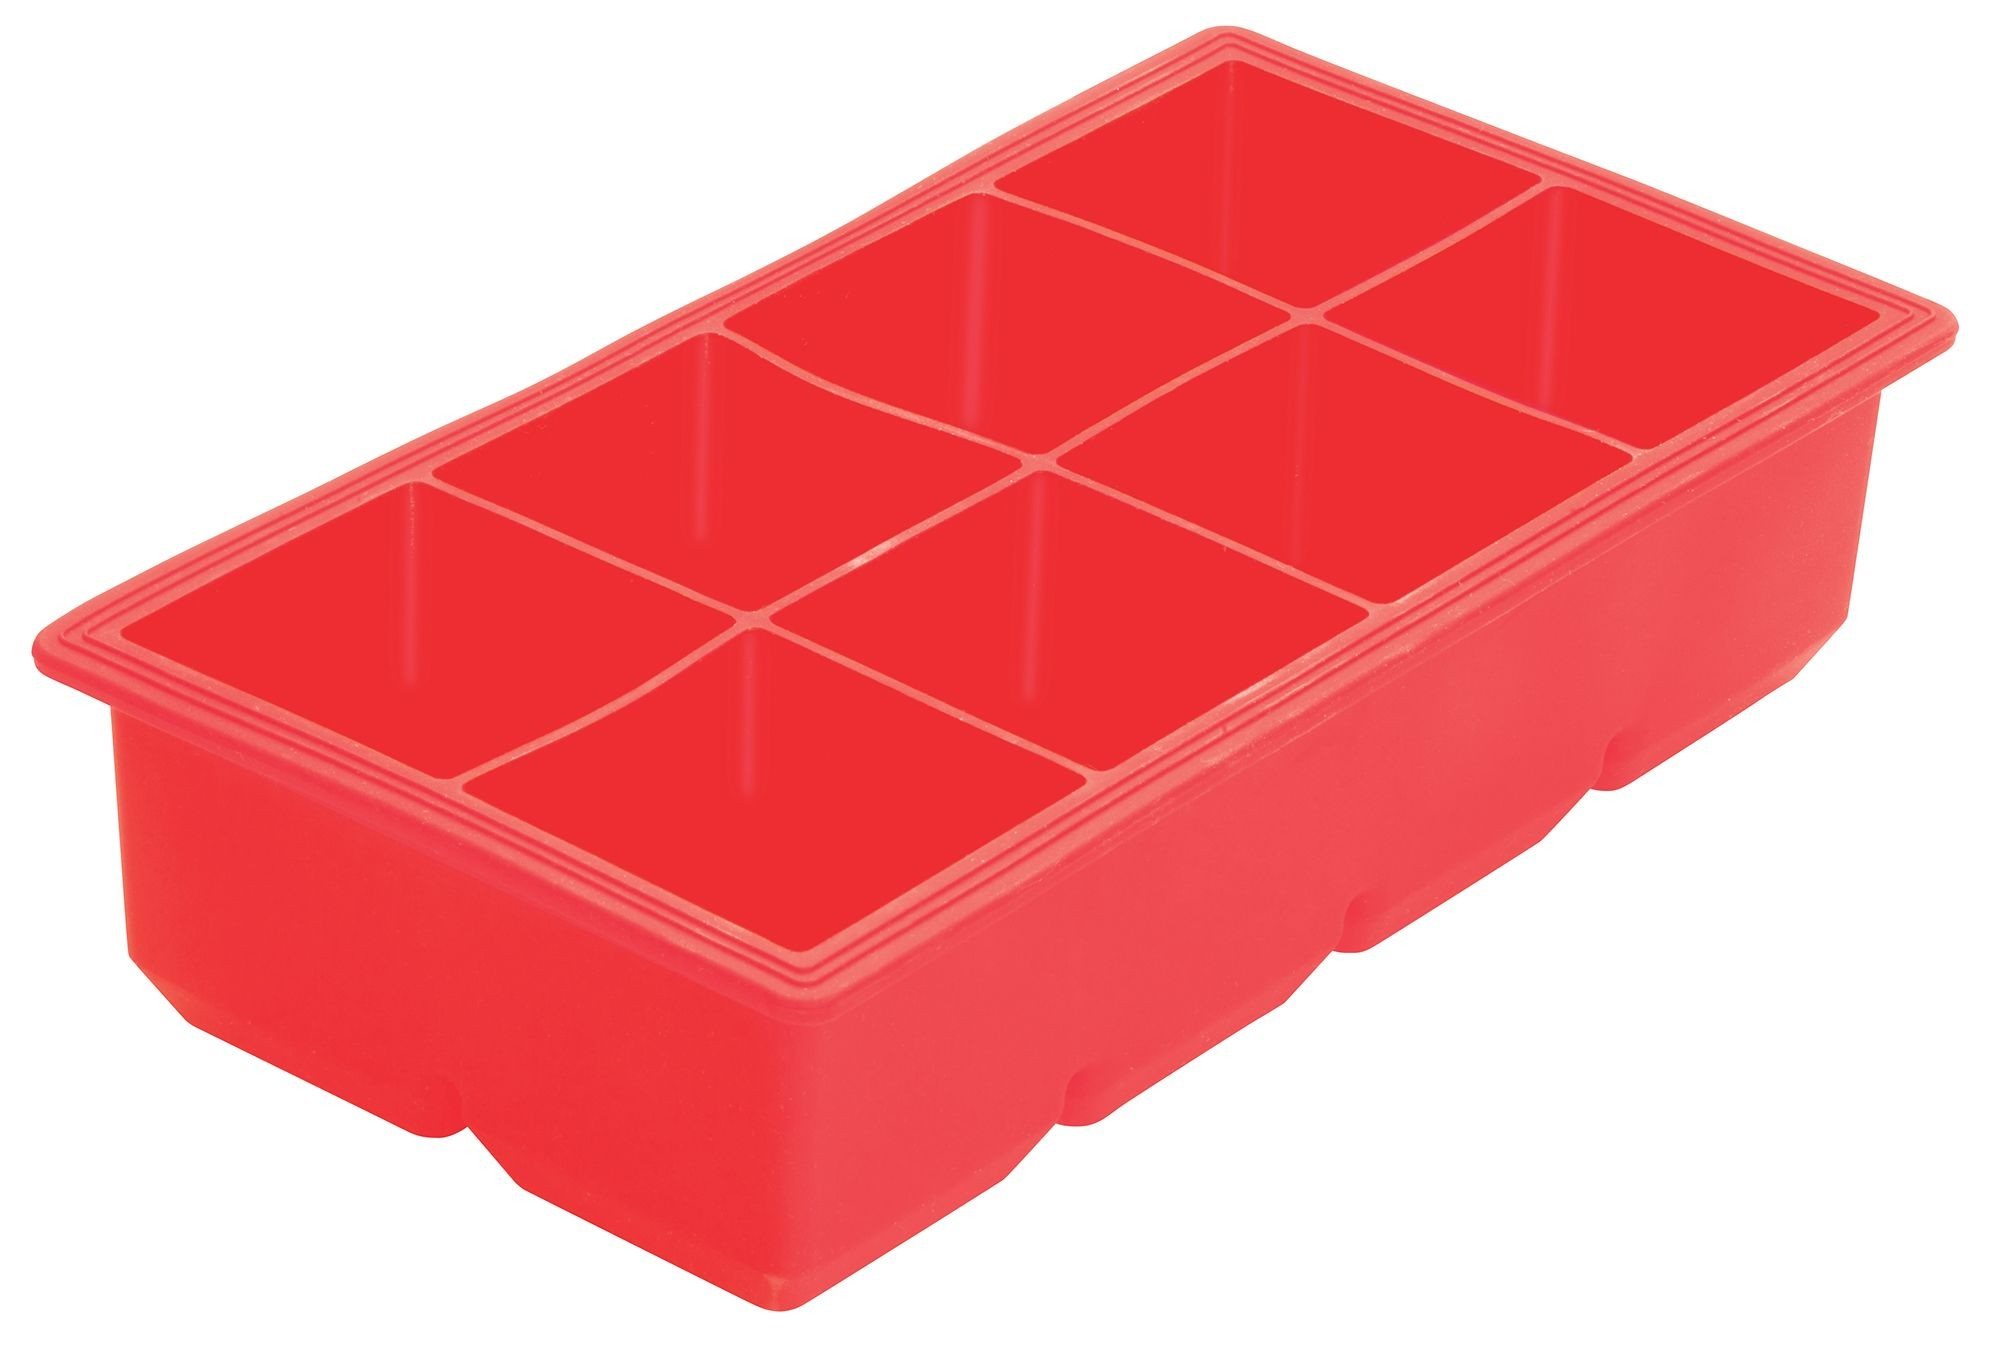 Winco ICCT-8R Silicone 8-Cube Ice Tray